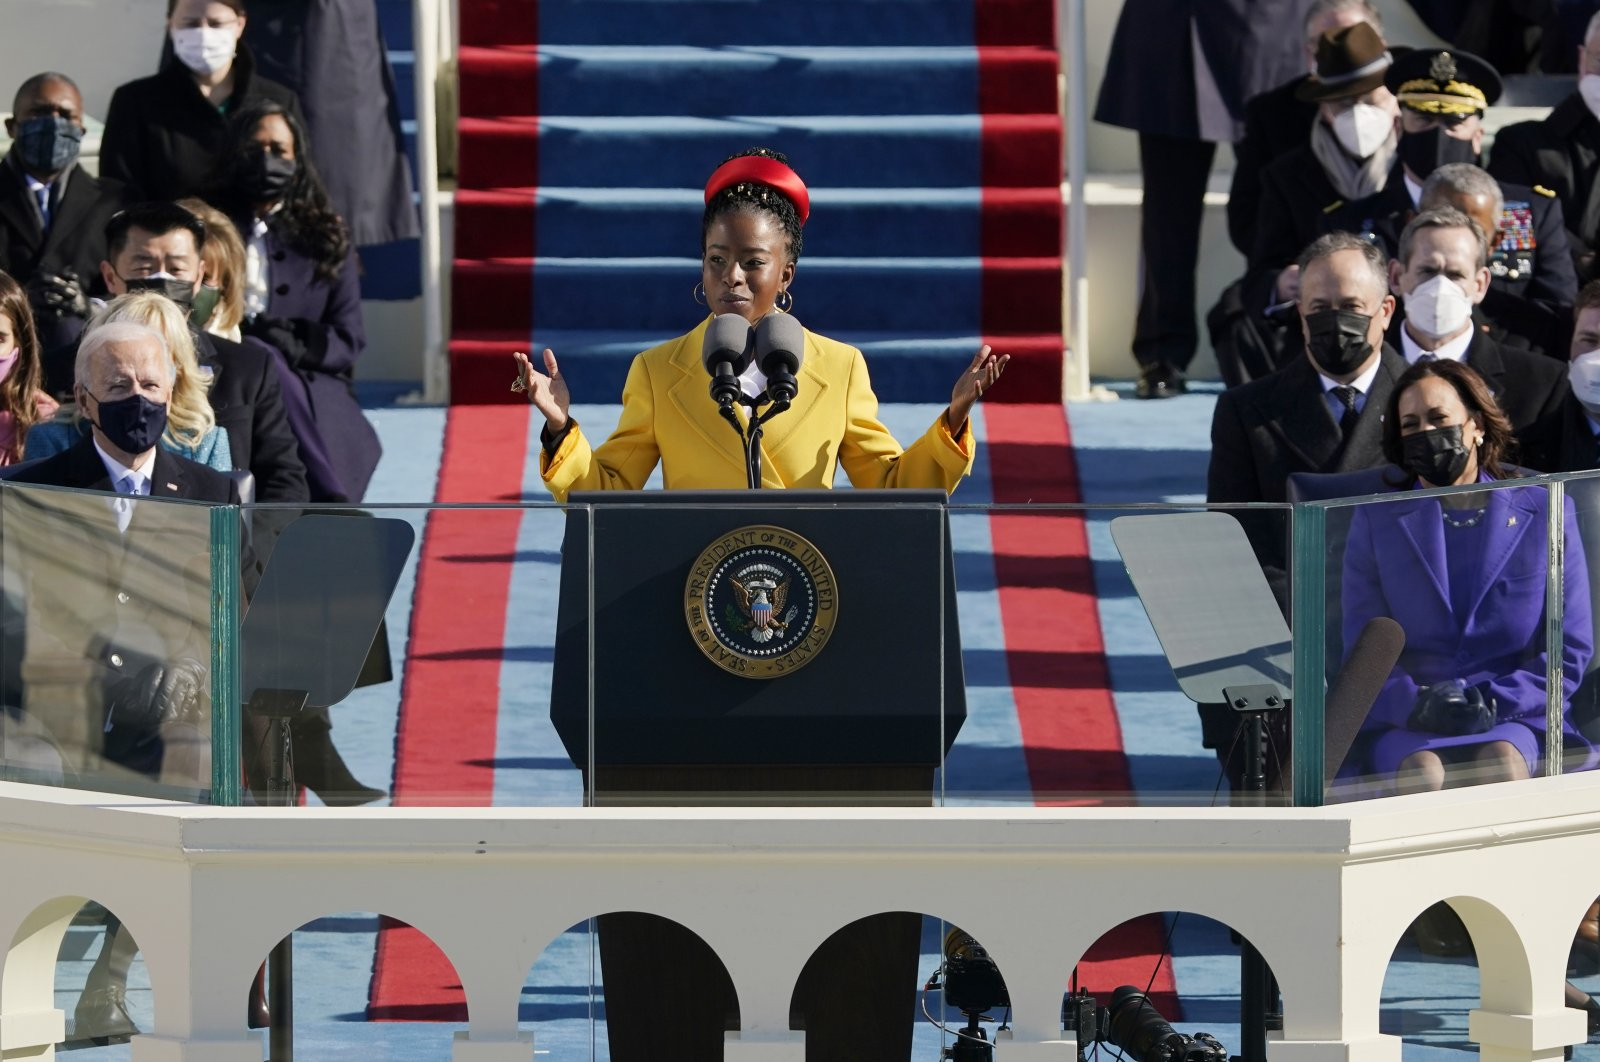 National youth poet laureate Amanda Gorman recites her inaugural poem during Joe Biden's presidential inauguration at the U.S. Capitol, Washington, D.C., the U.S., Jan. 20, 2021. (AP Photo)